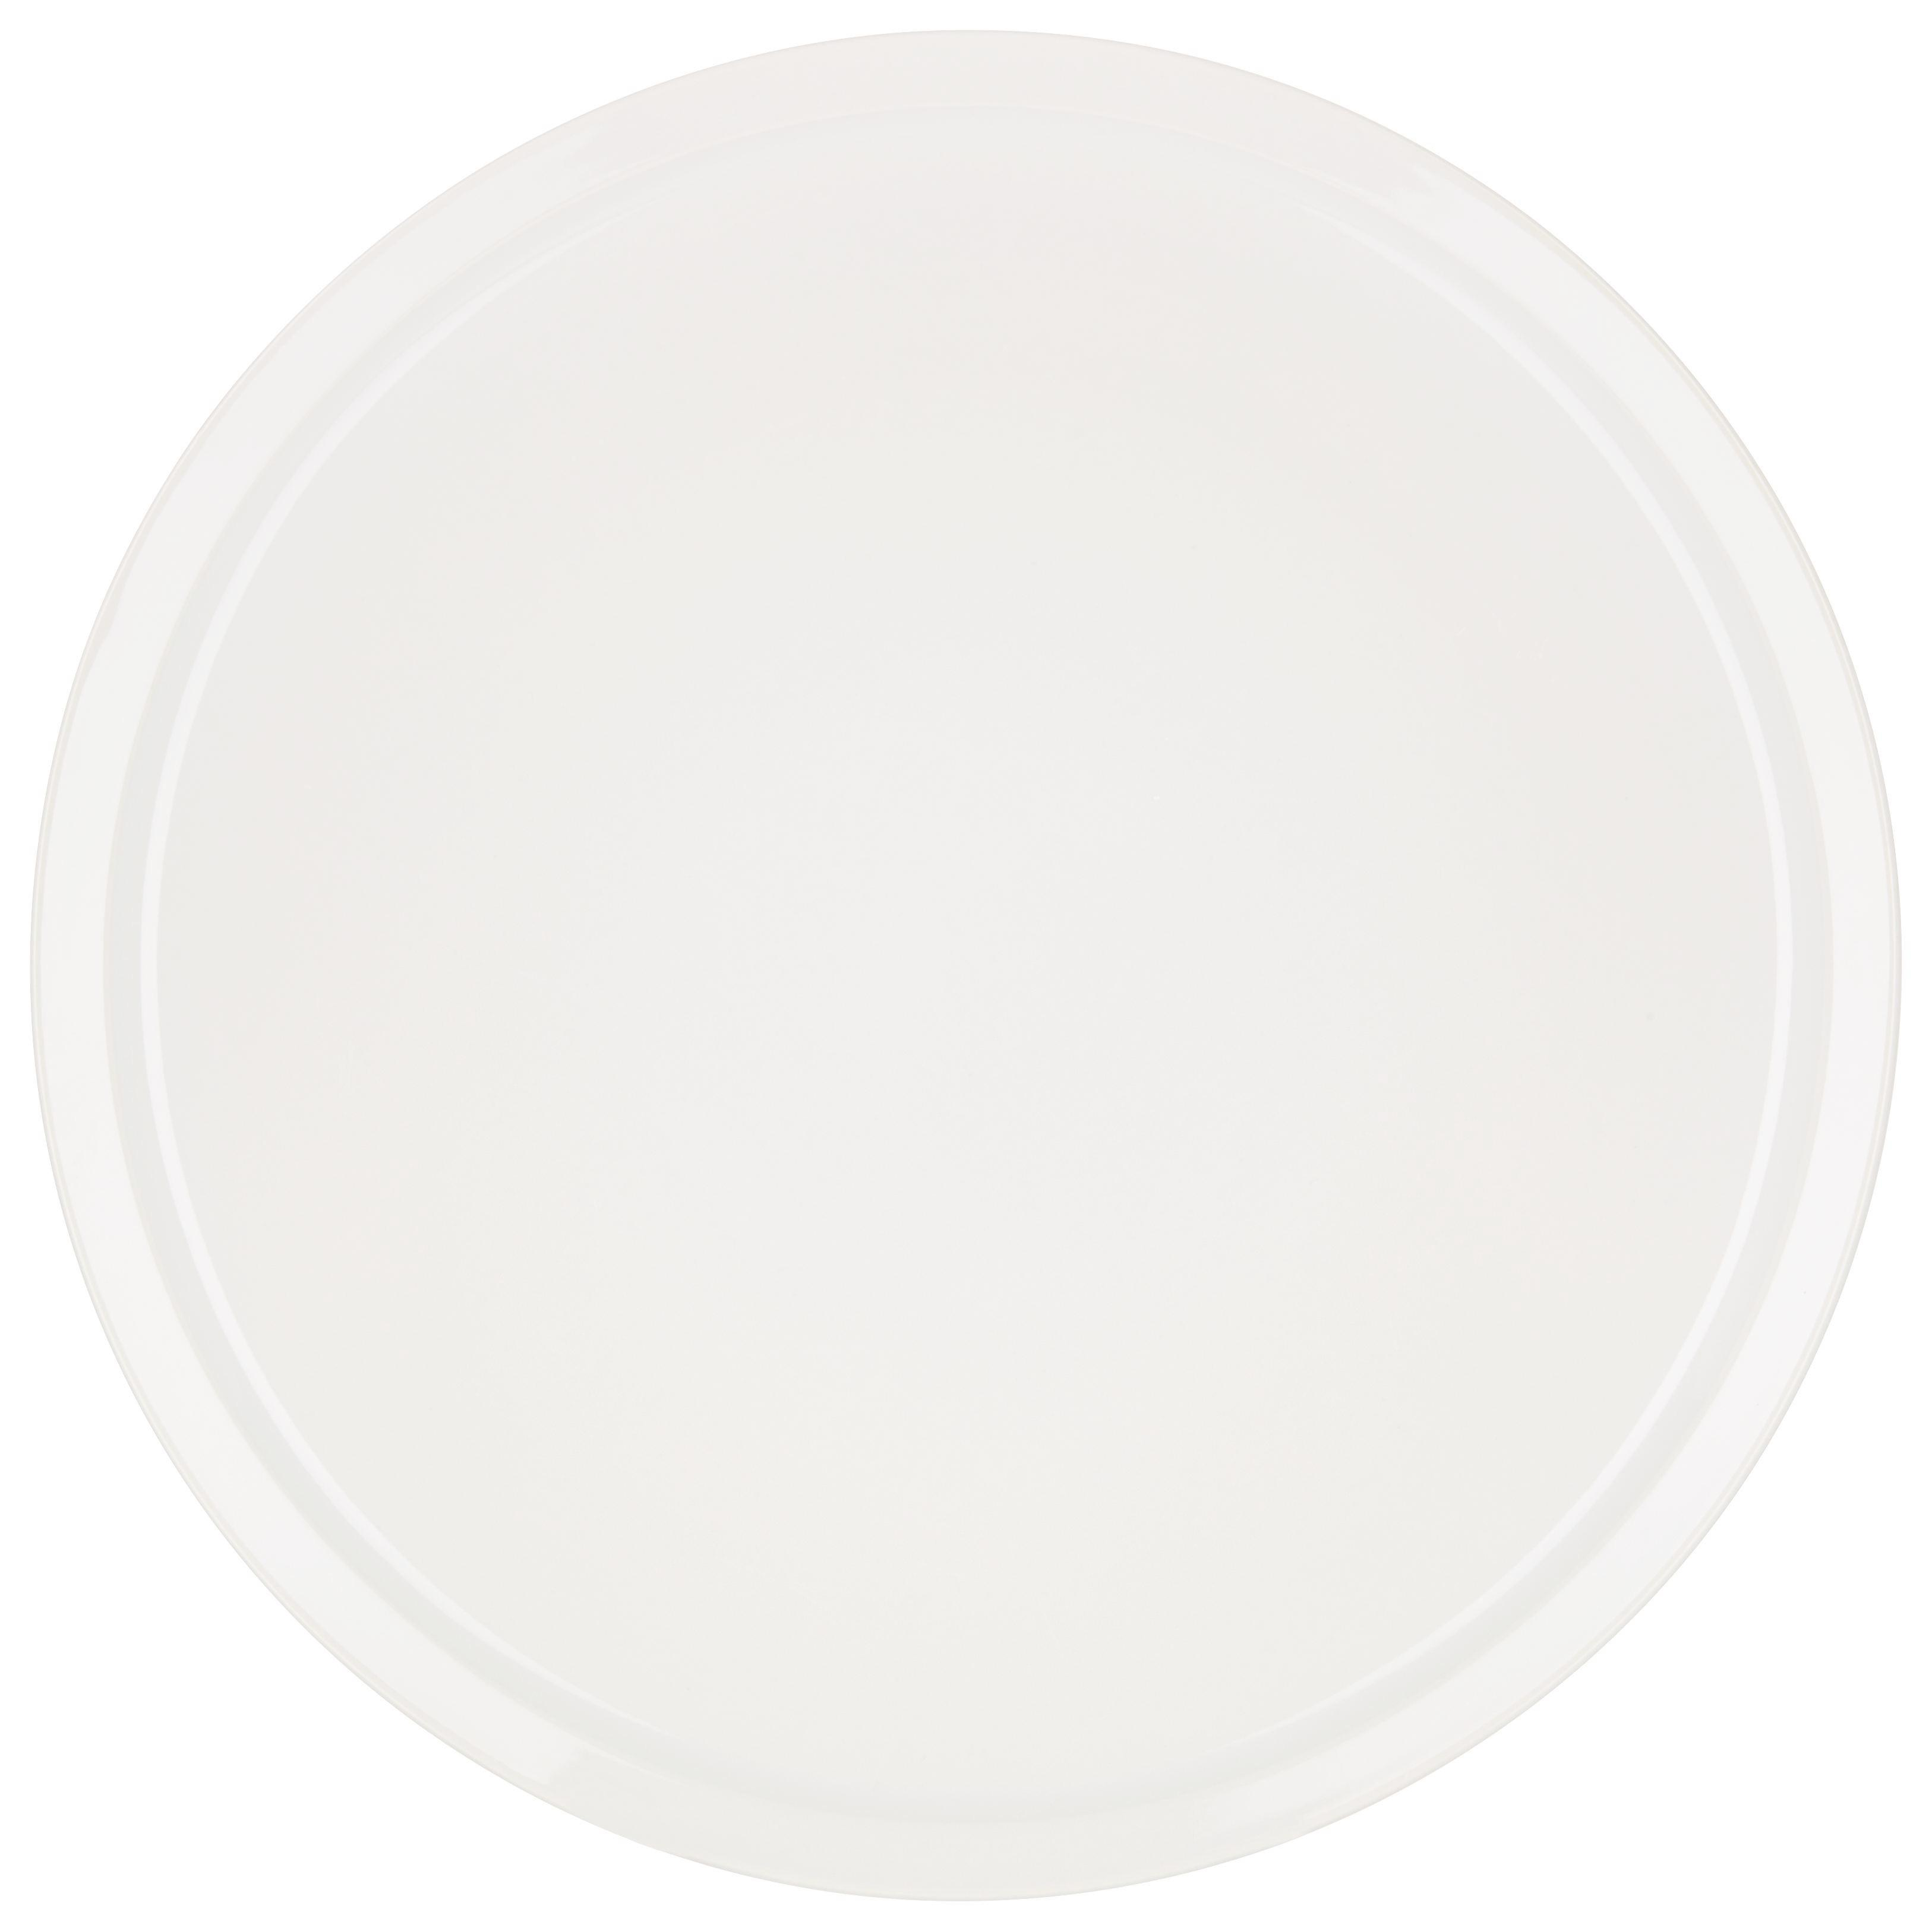 Krožnik Za Pico Adria - bela, keramika (30cm) - MÖMAX modern living